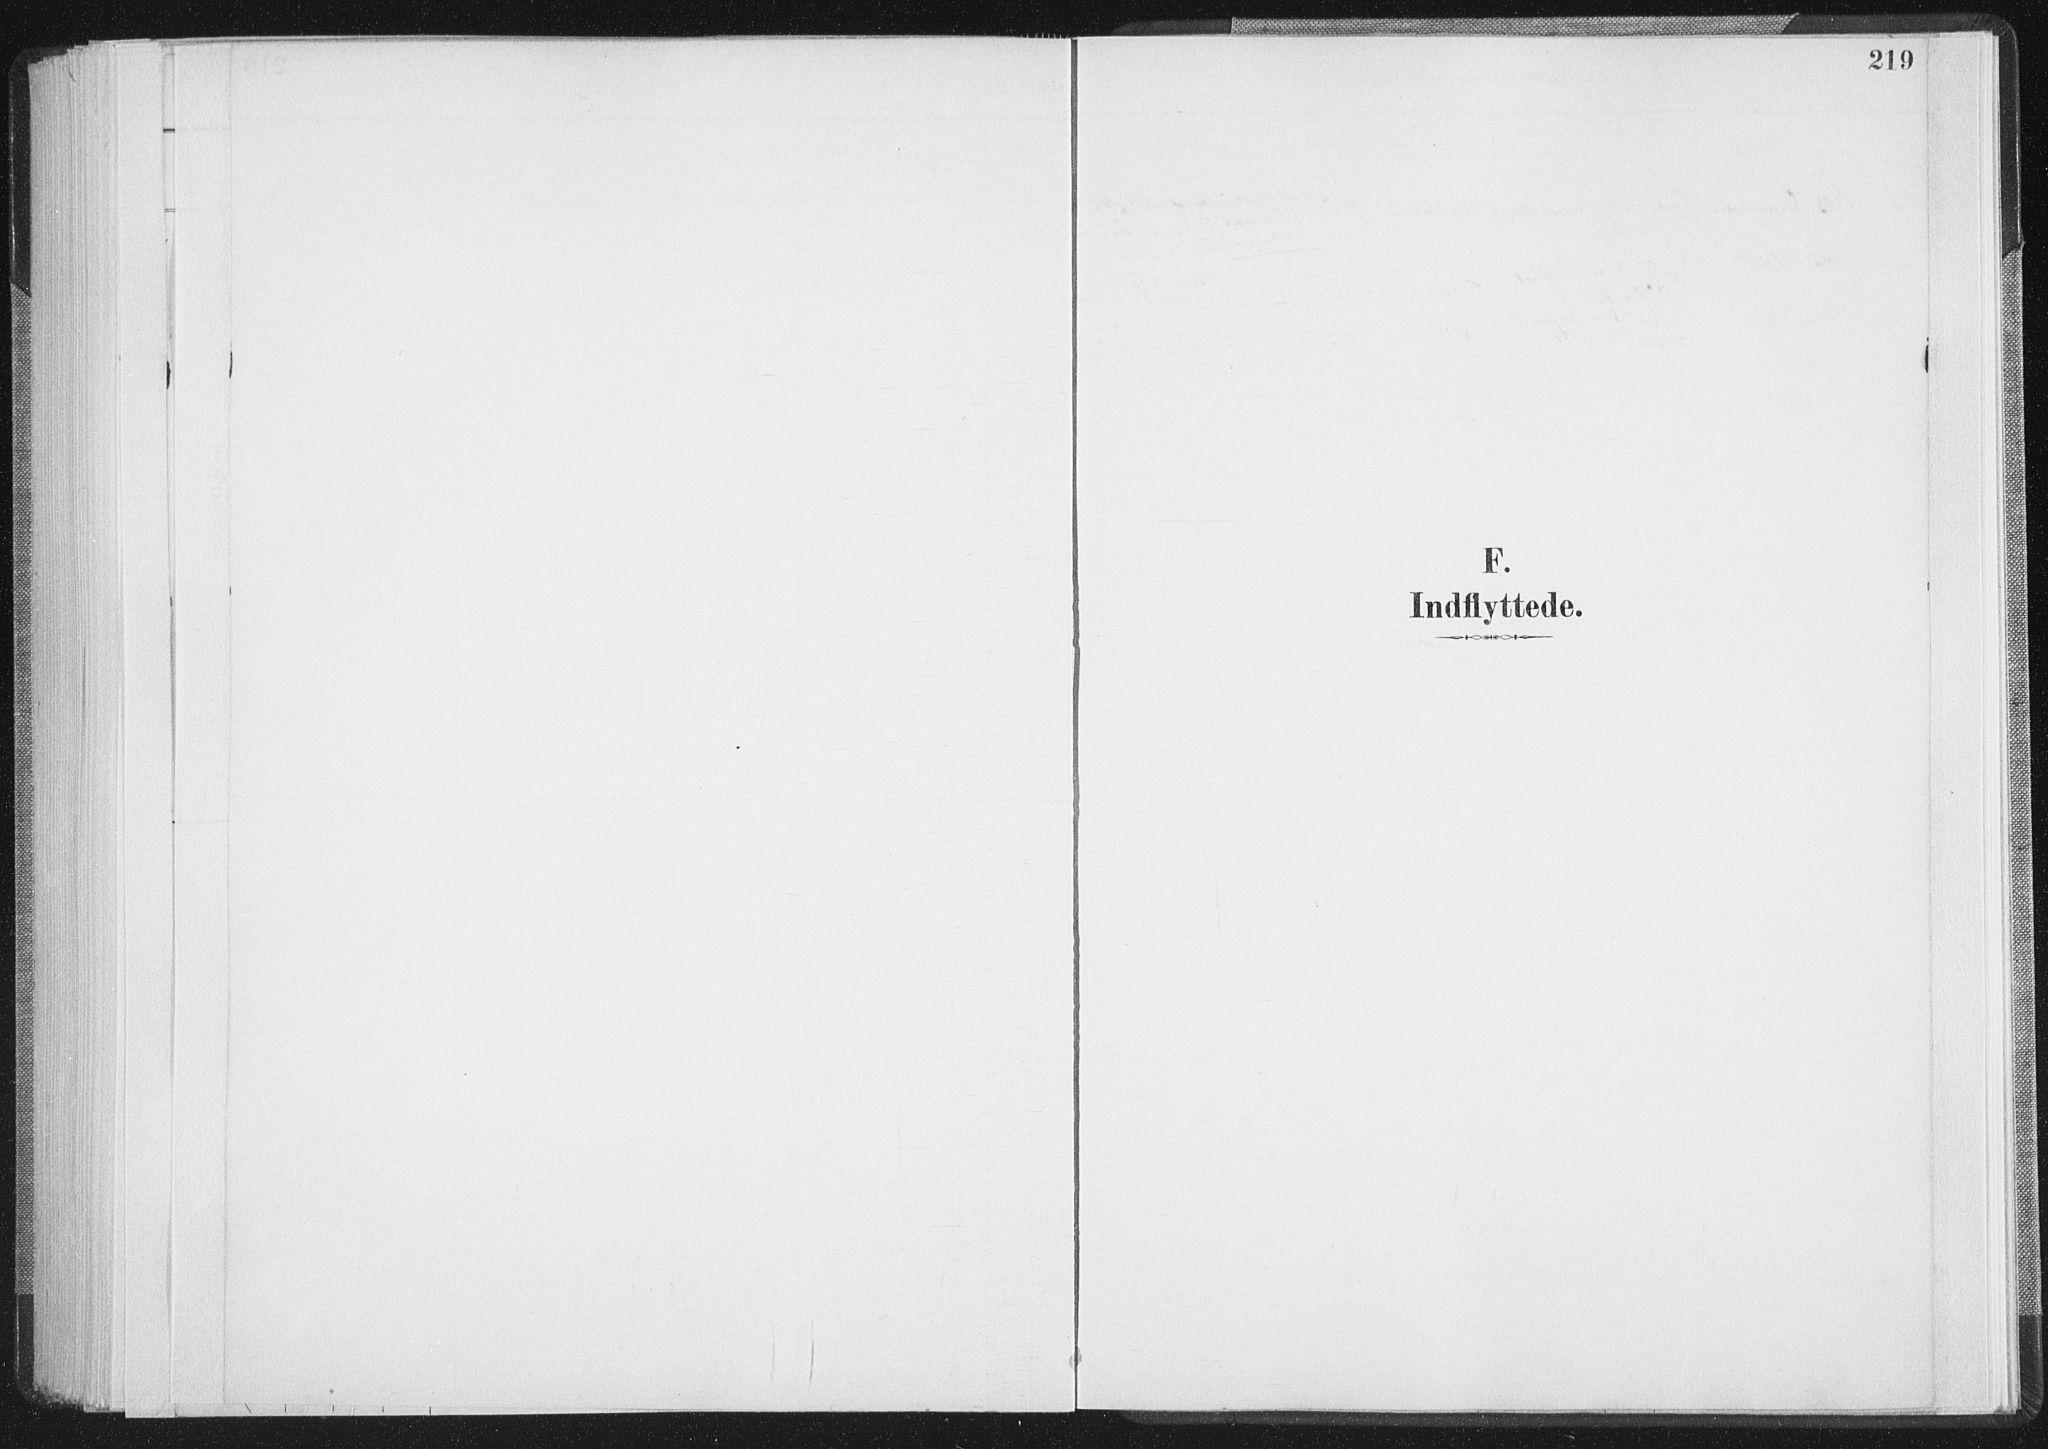 SAT, Ministerialprotokoller, klokkerbøker og fødselsregistre - Nordland, 898/L1422: Ministerialbok nr. 898A02, 1887-1908, s. 219